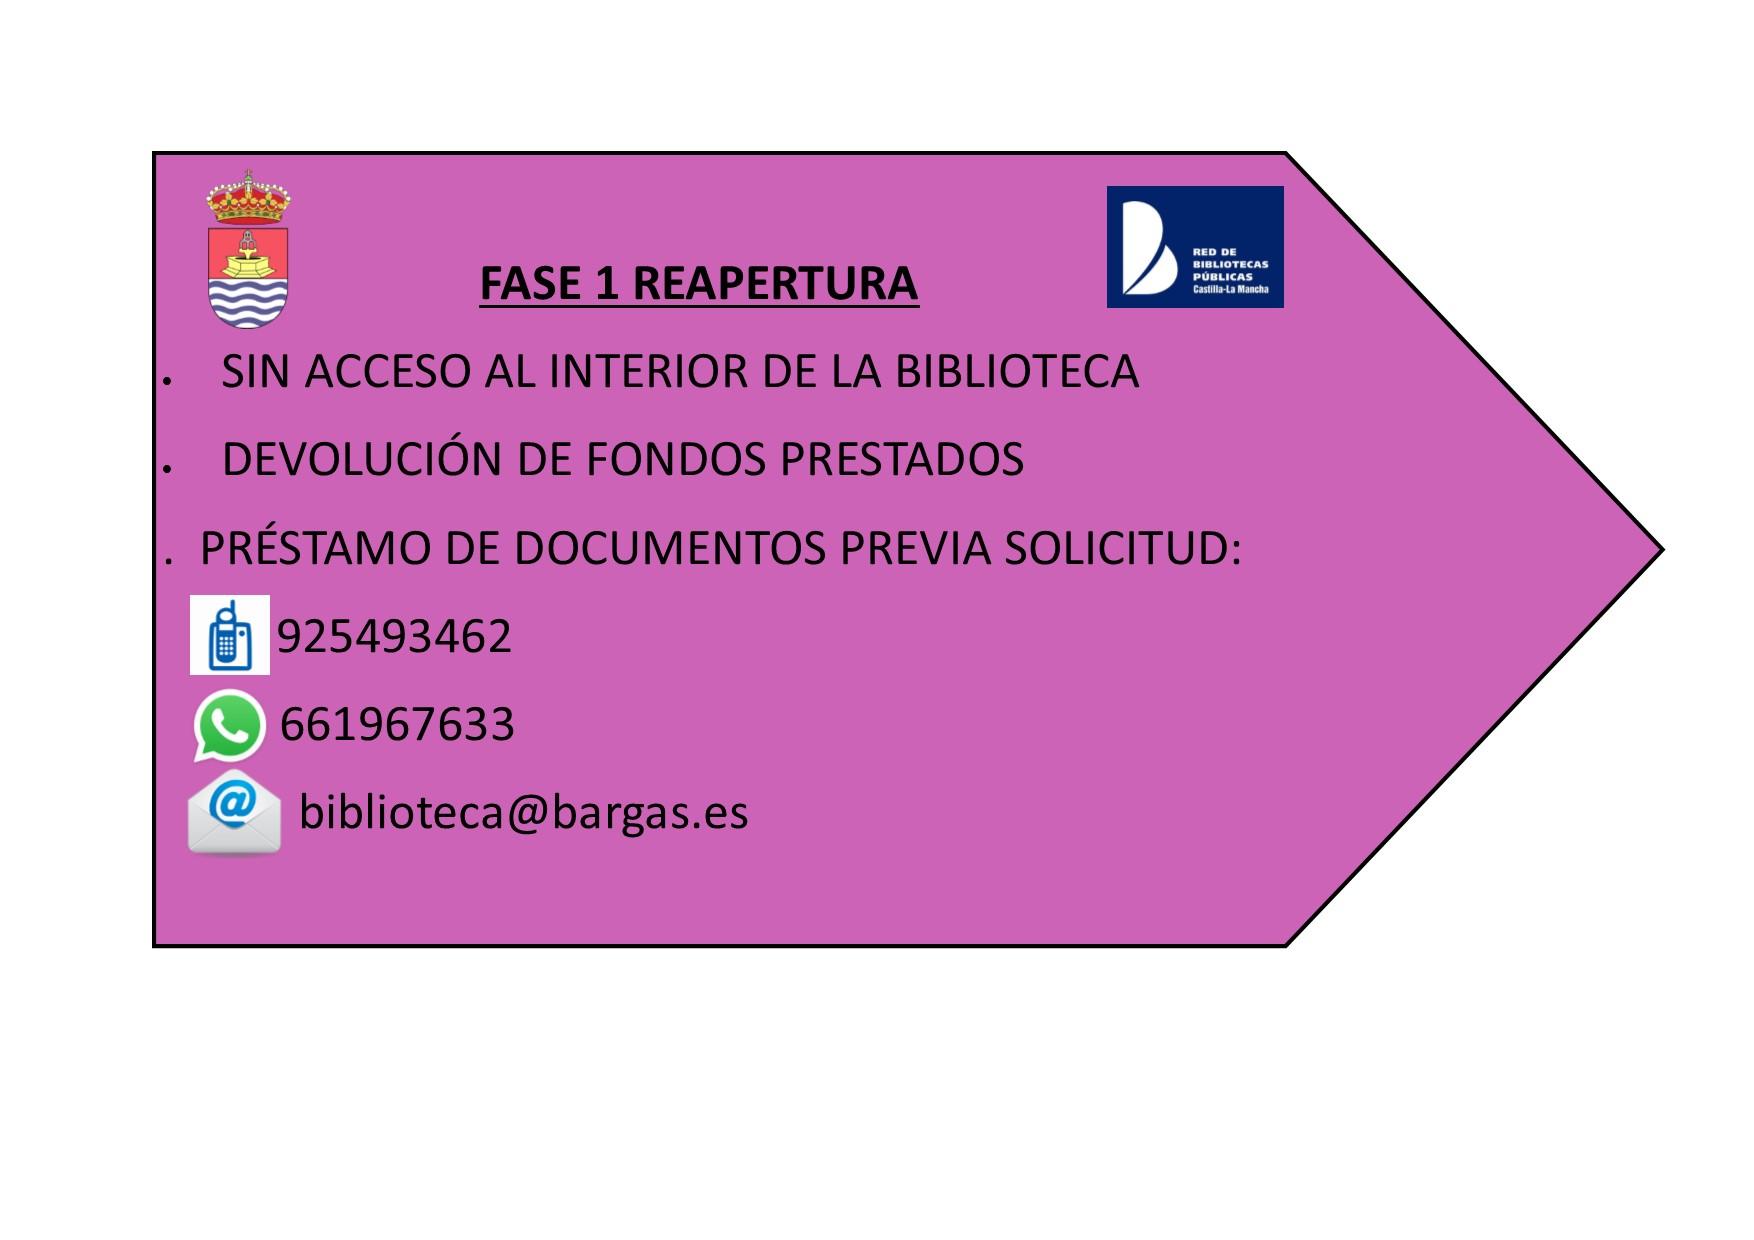 REAPERTURA FASE 1